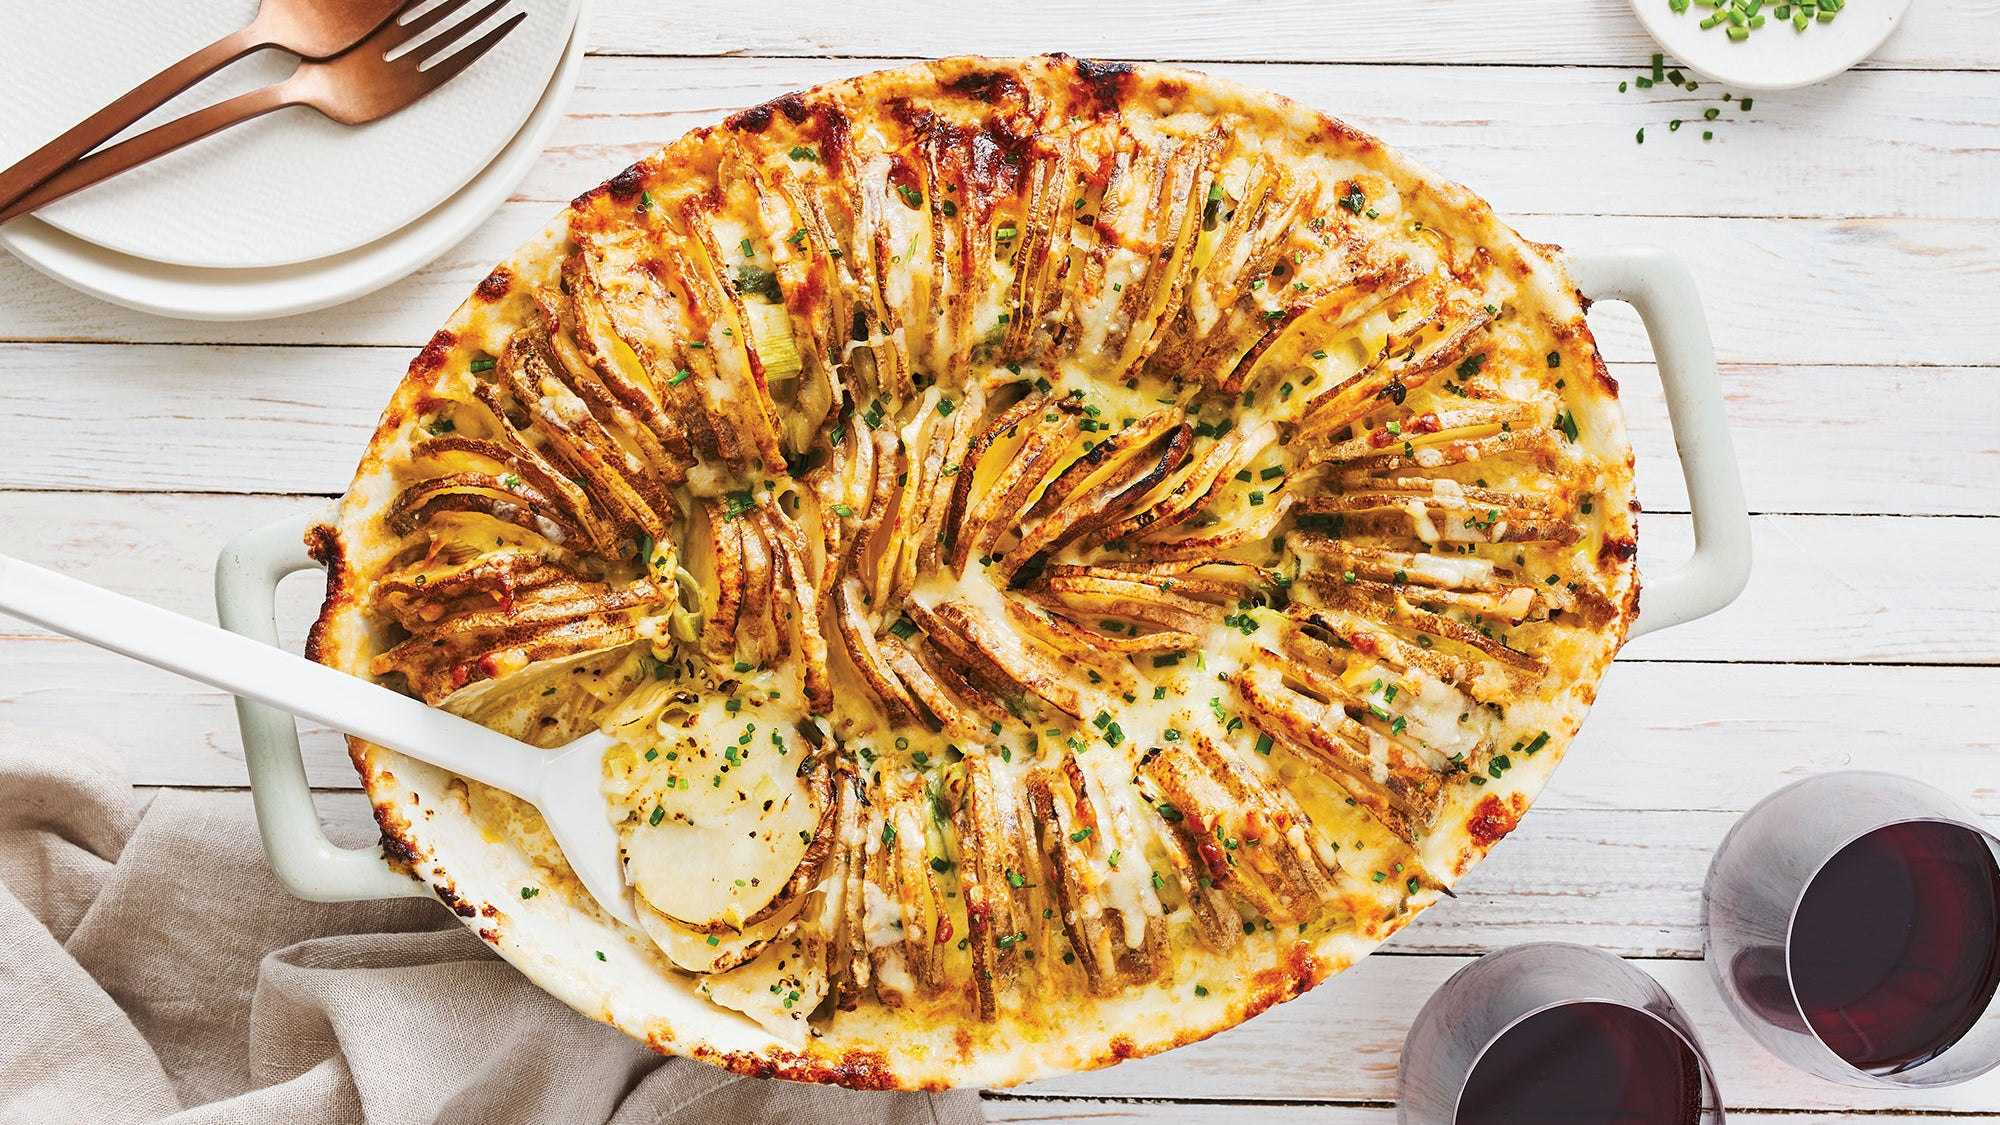 Potato, Leek & Artichoke Sideways Gratin recipe